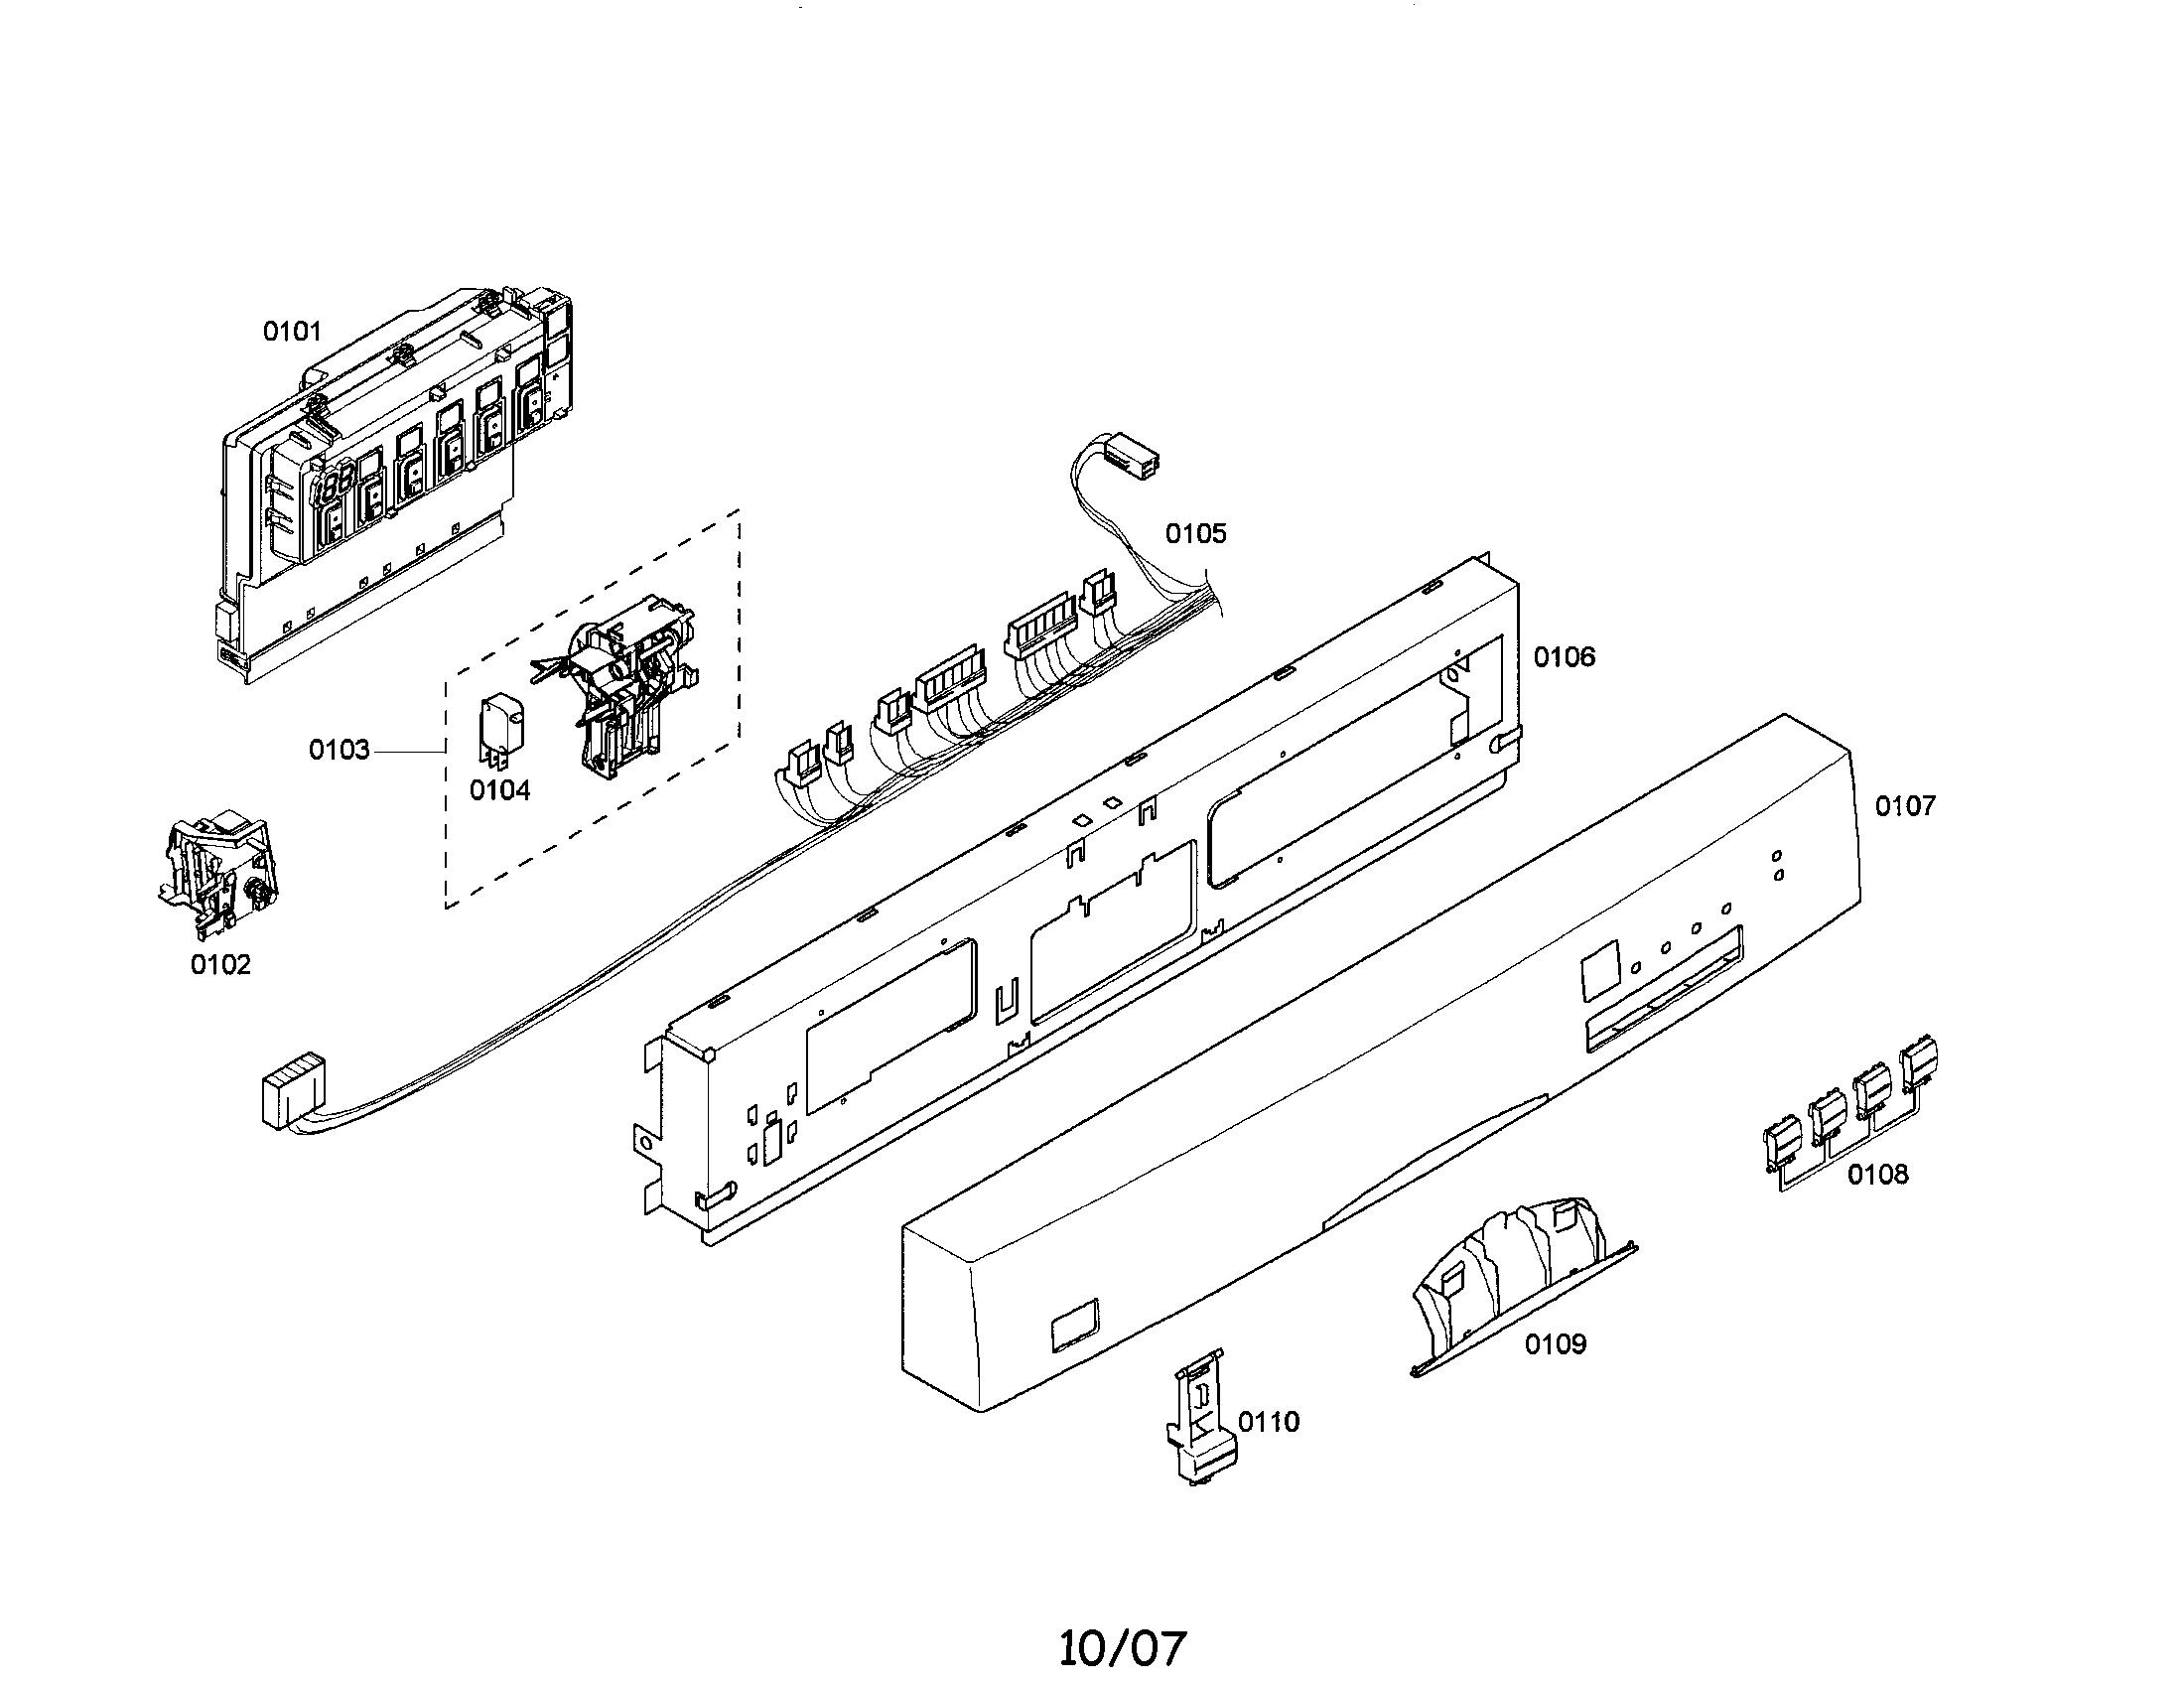 Bosch model SHE44C02UC/22 dishwasher genuine parts